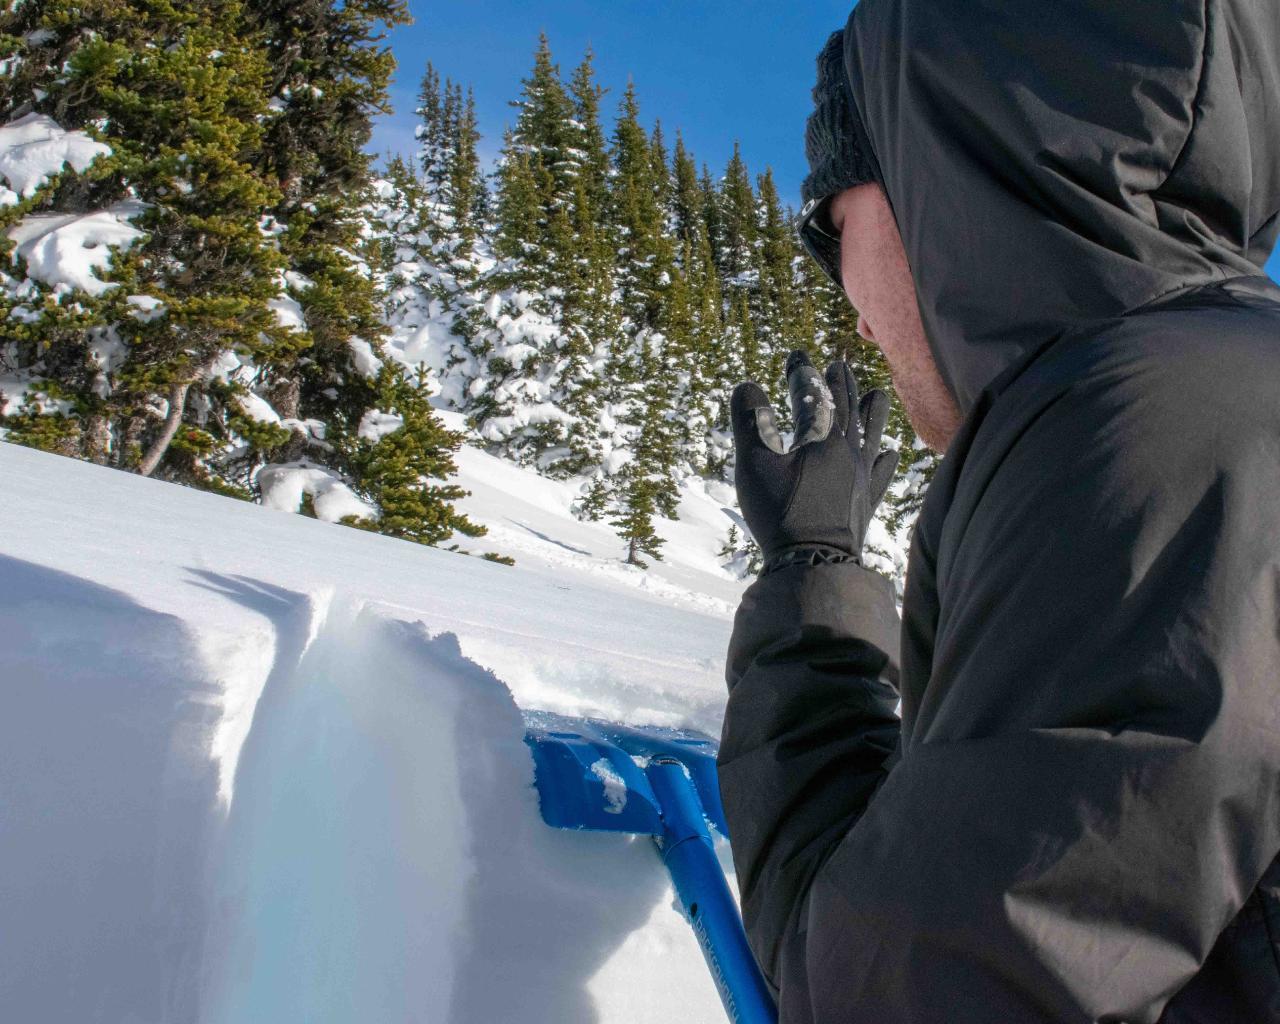 Private - Avalanche Skills Training 1 - Snowshoe